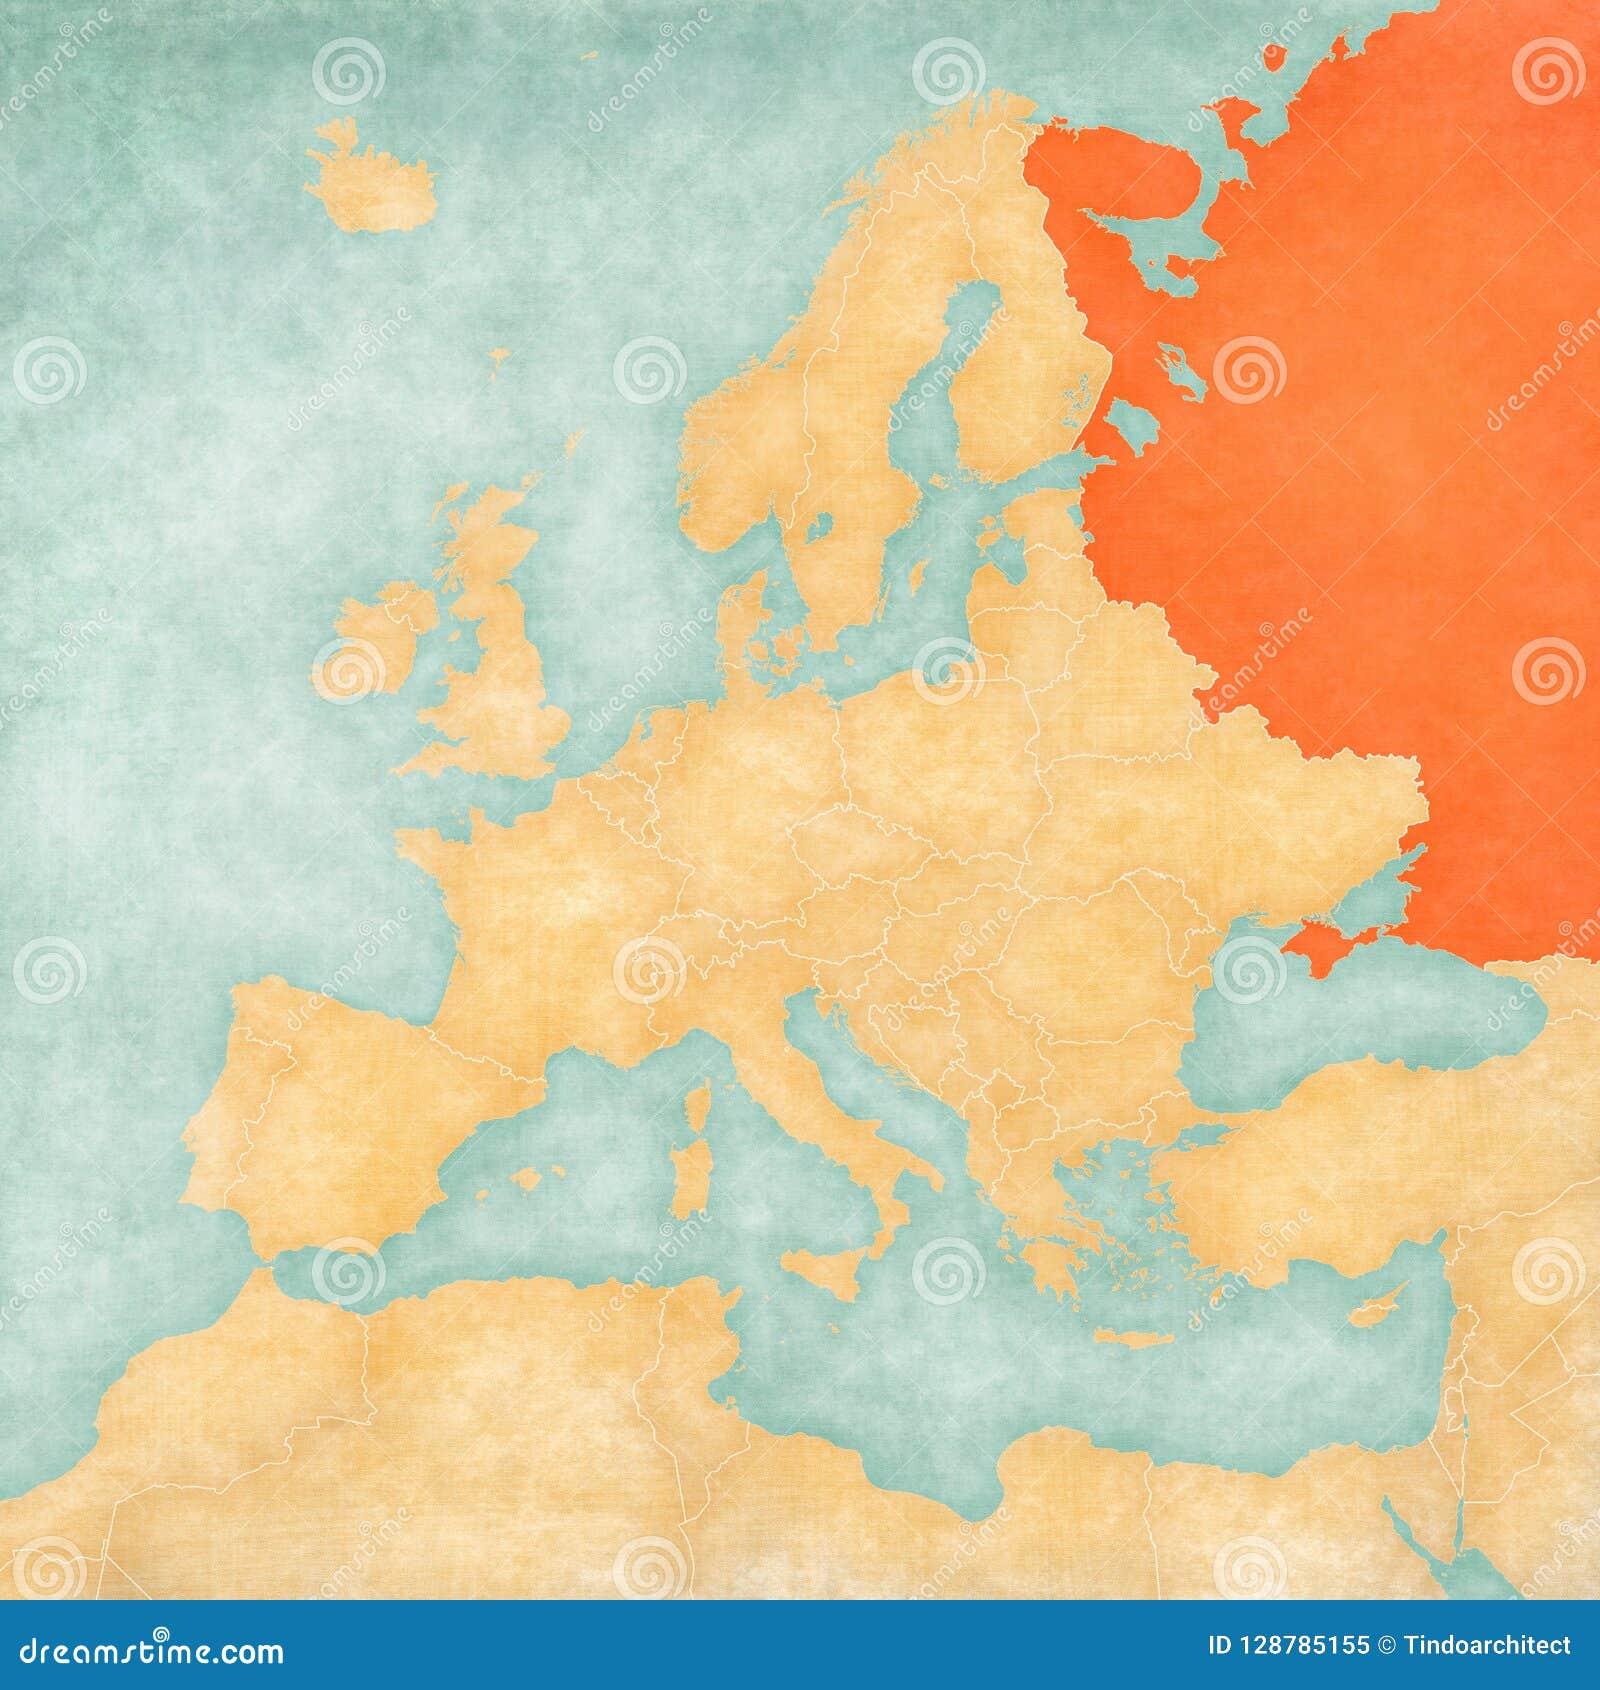 Map of Europe - Russia stock illustration. Illustration of ...